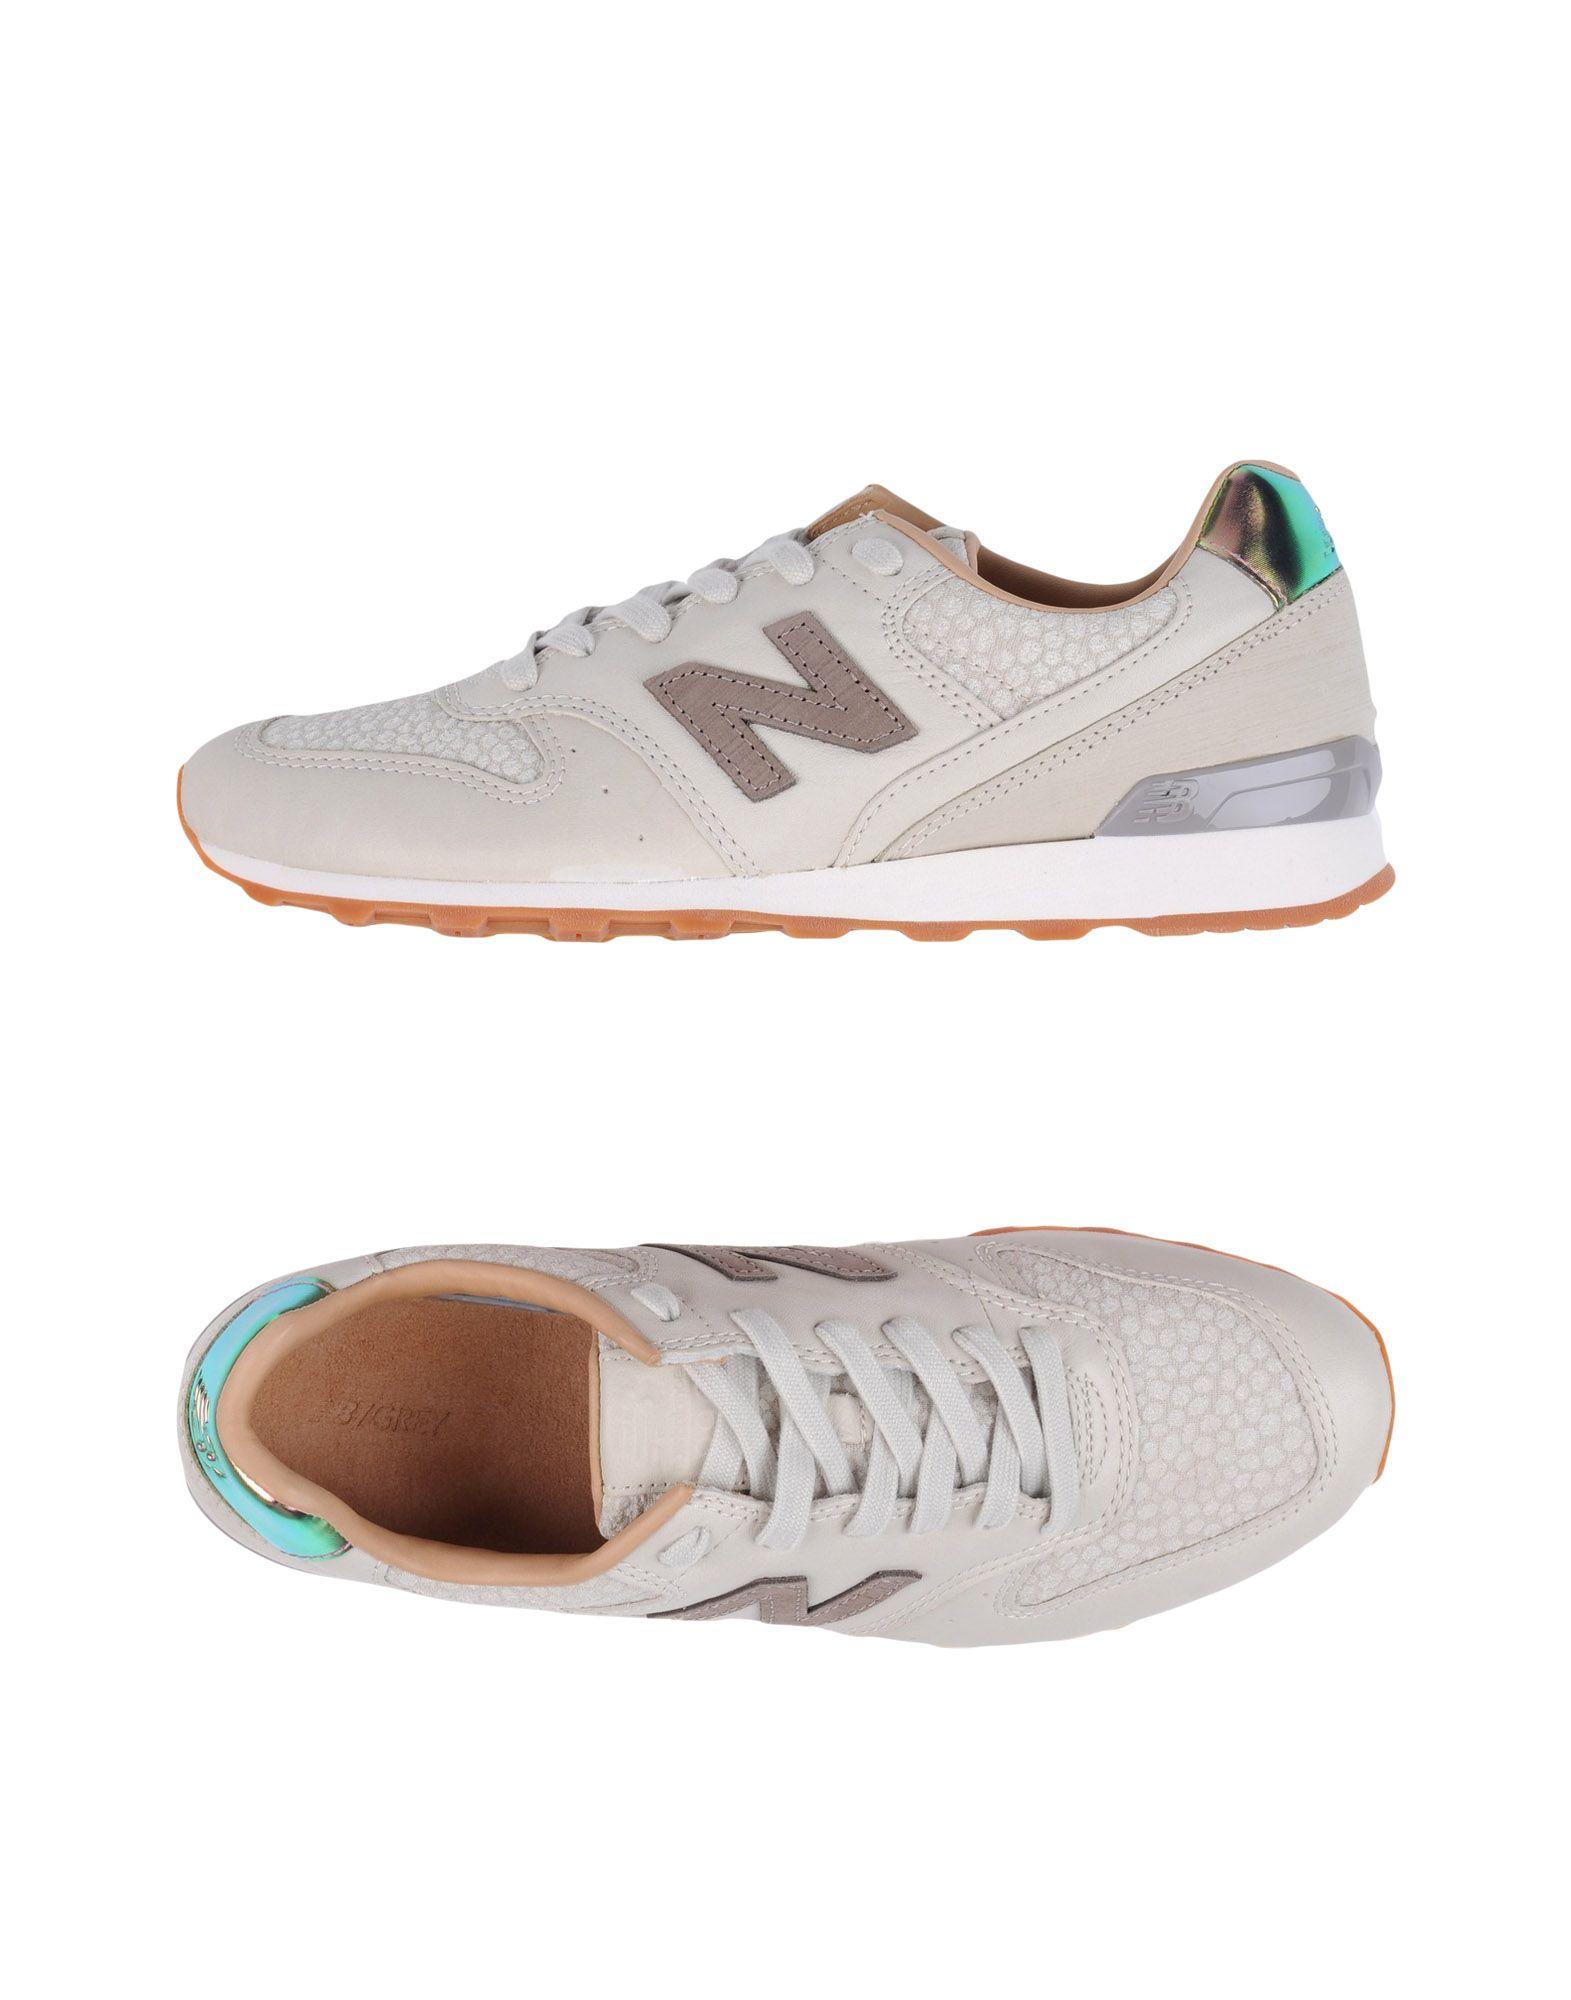 New Balance Neue 996 Grey Pack  11195934GM Neue Balance Schuhe 654db9